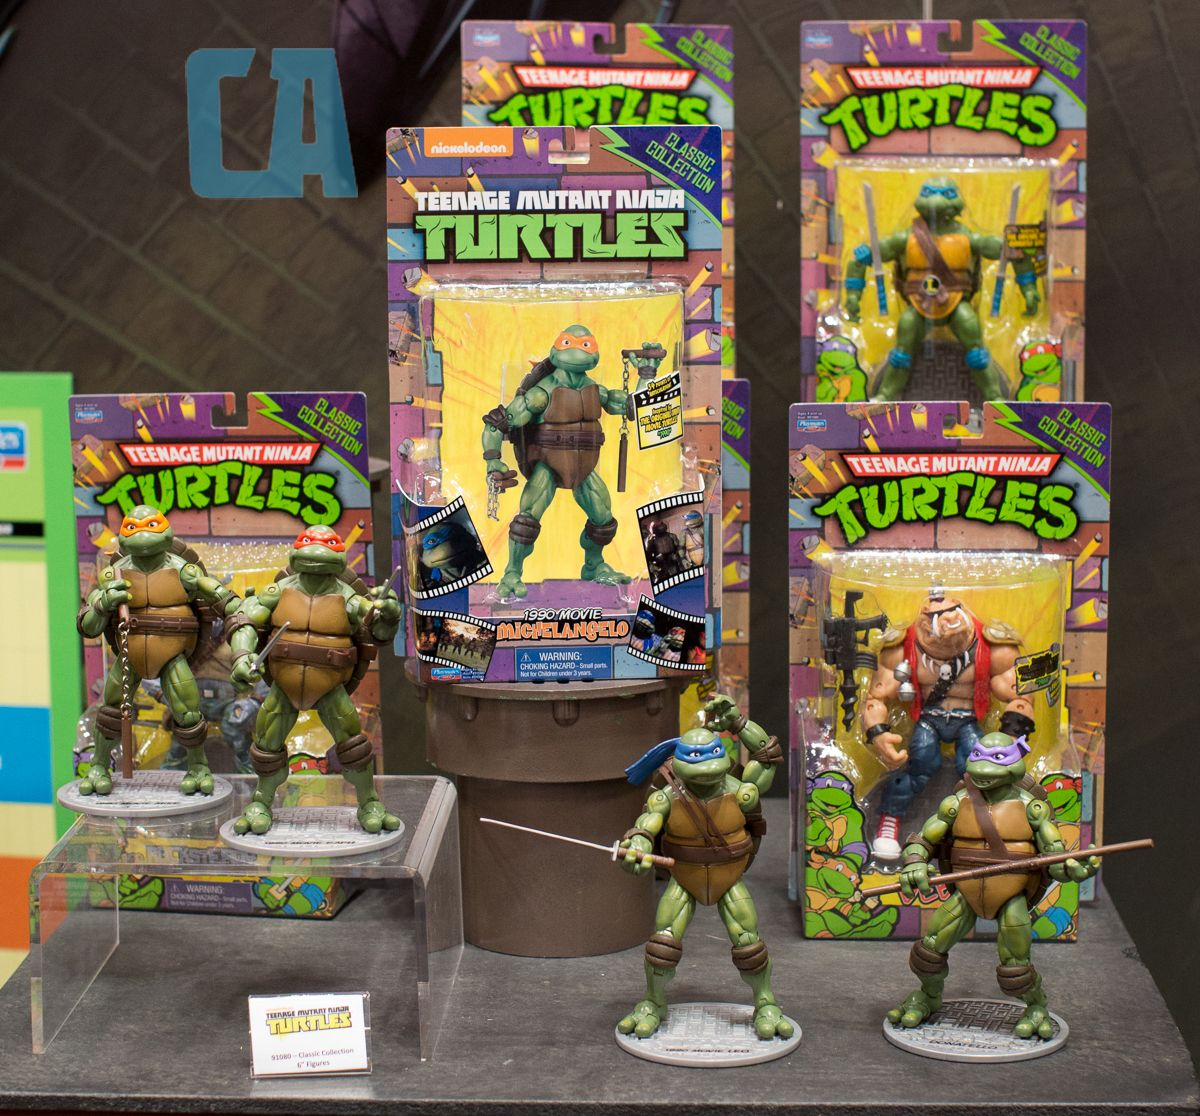 Ninja Turtle Chair Toys R Us Wheelchair Accessories Tortugas Pelicula De Los 90 39s Pinterest